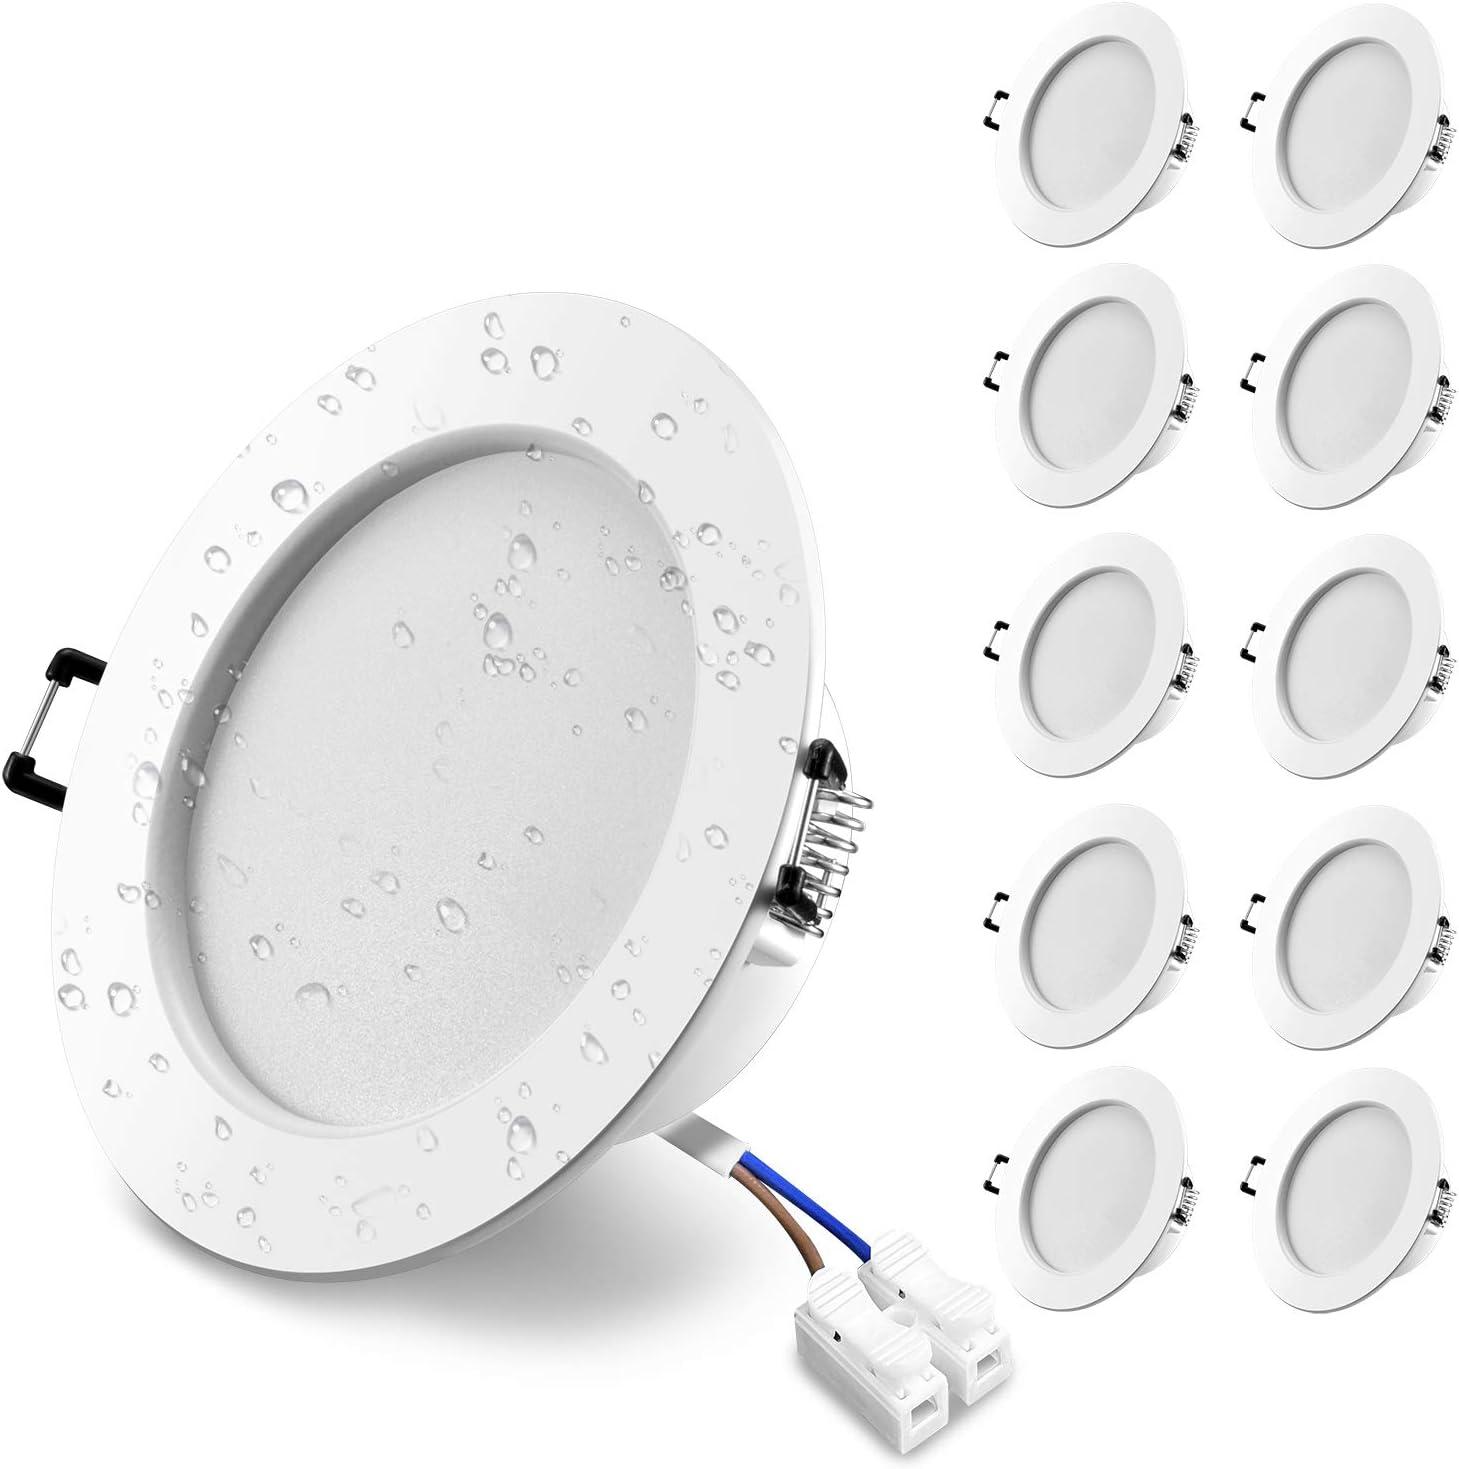 "10X Downlight LED Recessed Ceiling Light IP44 7W = 70W Halogen Bulb Cool White 6000K Waterproof for Bathroom Kitchen Wowatt Spot Light 630LM Cut /Φ3.15-3.55/"" 80-90mm CRI83 Not Dimmable 230V Pack of 10"